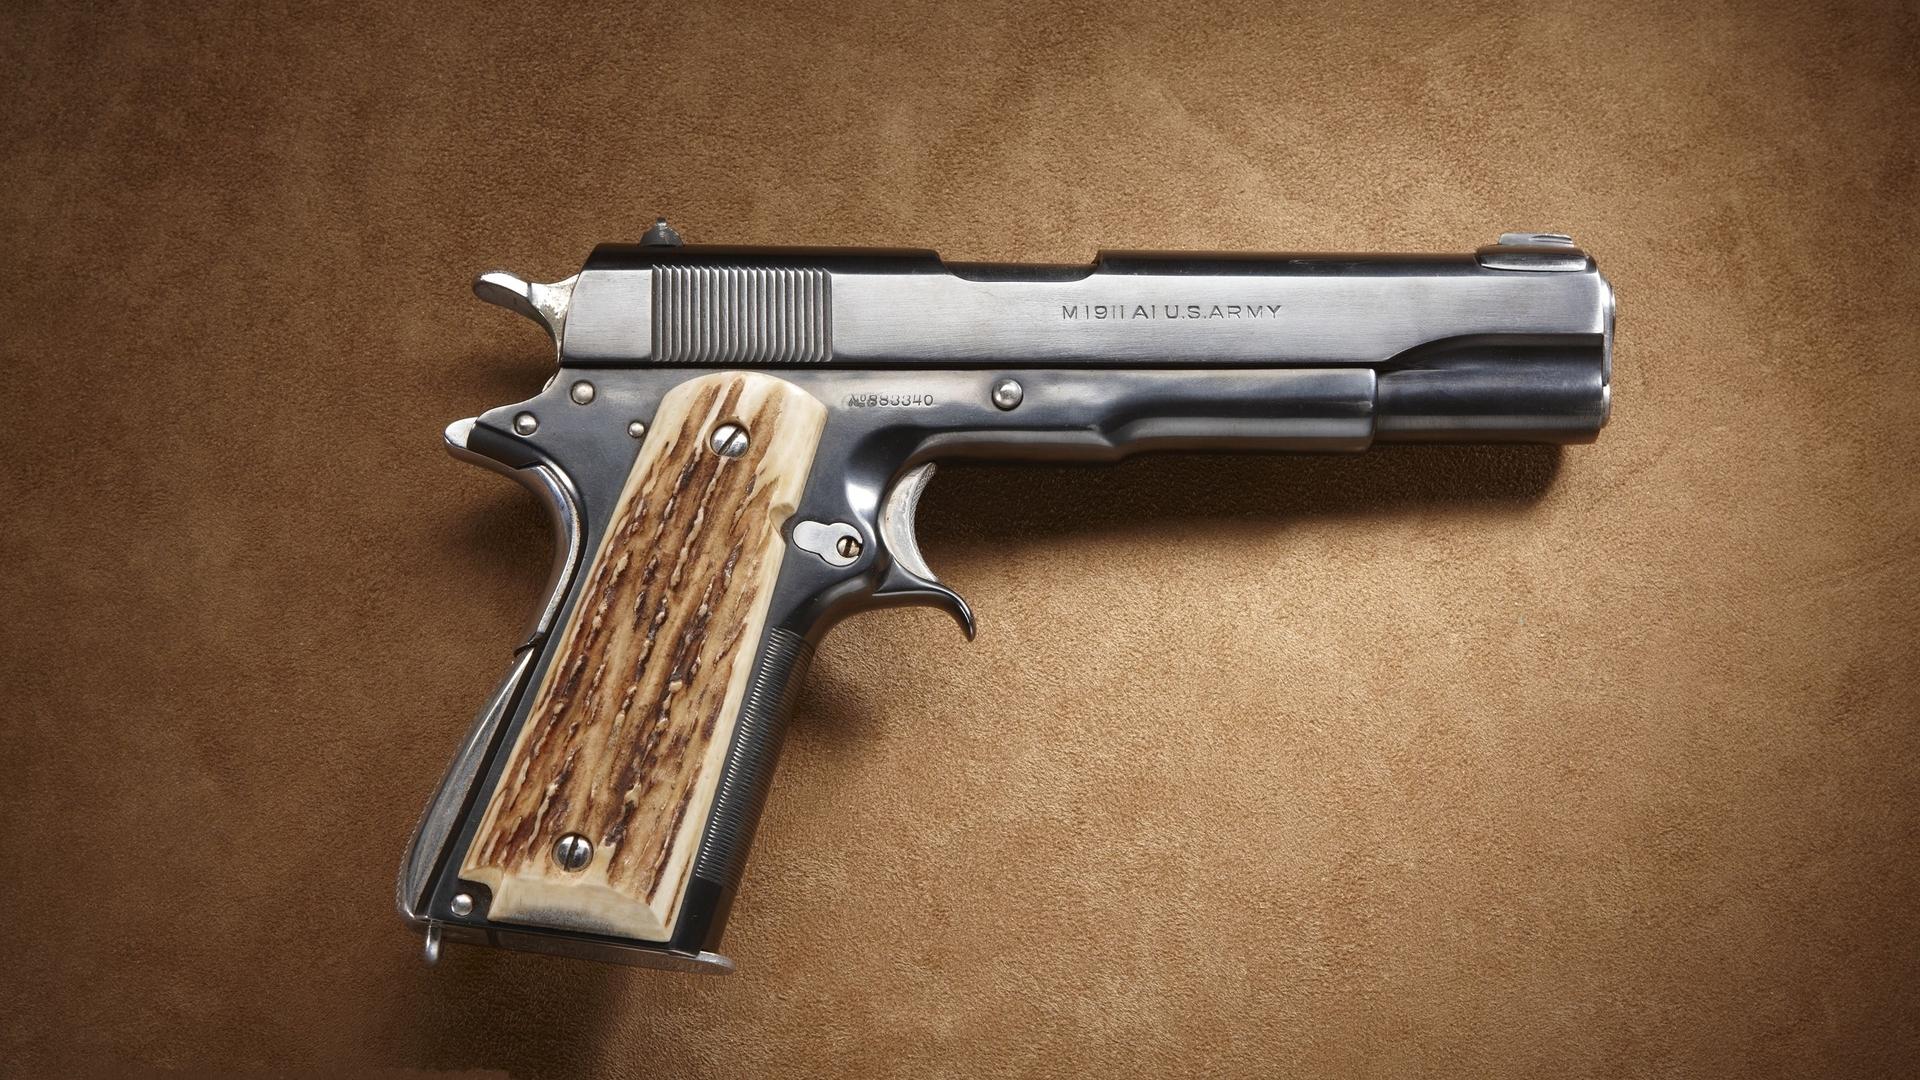 Colt 1911 Pistol Computer Wallpapers Desktop Backgrounds 1920x1080 1920x1080